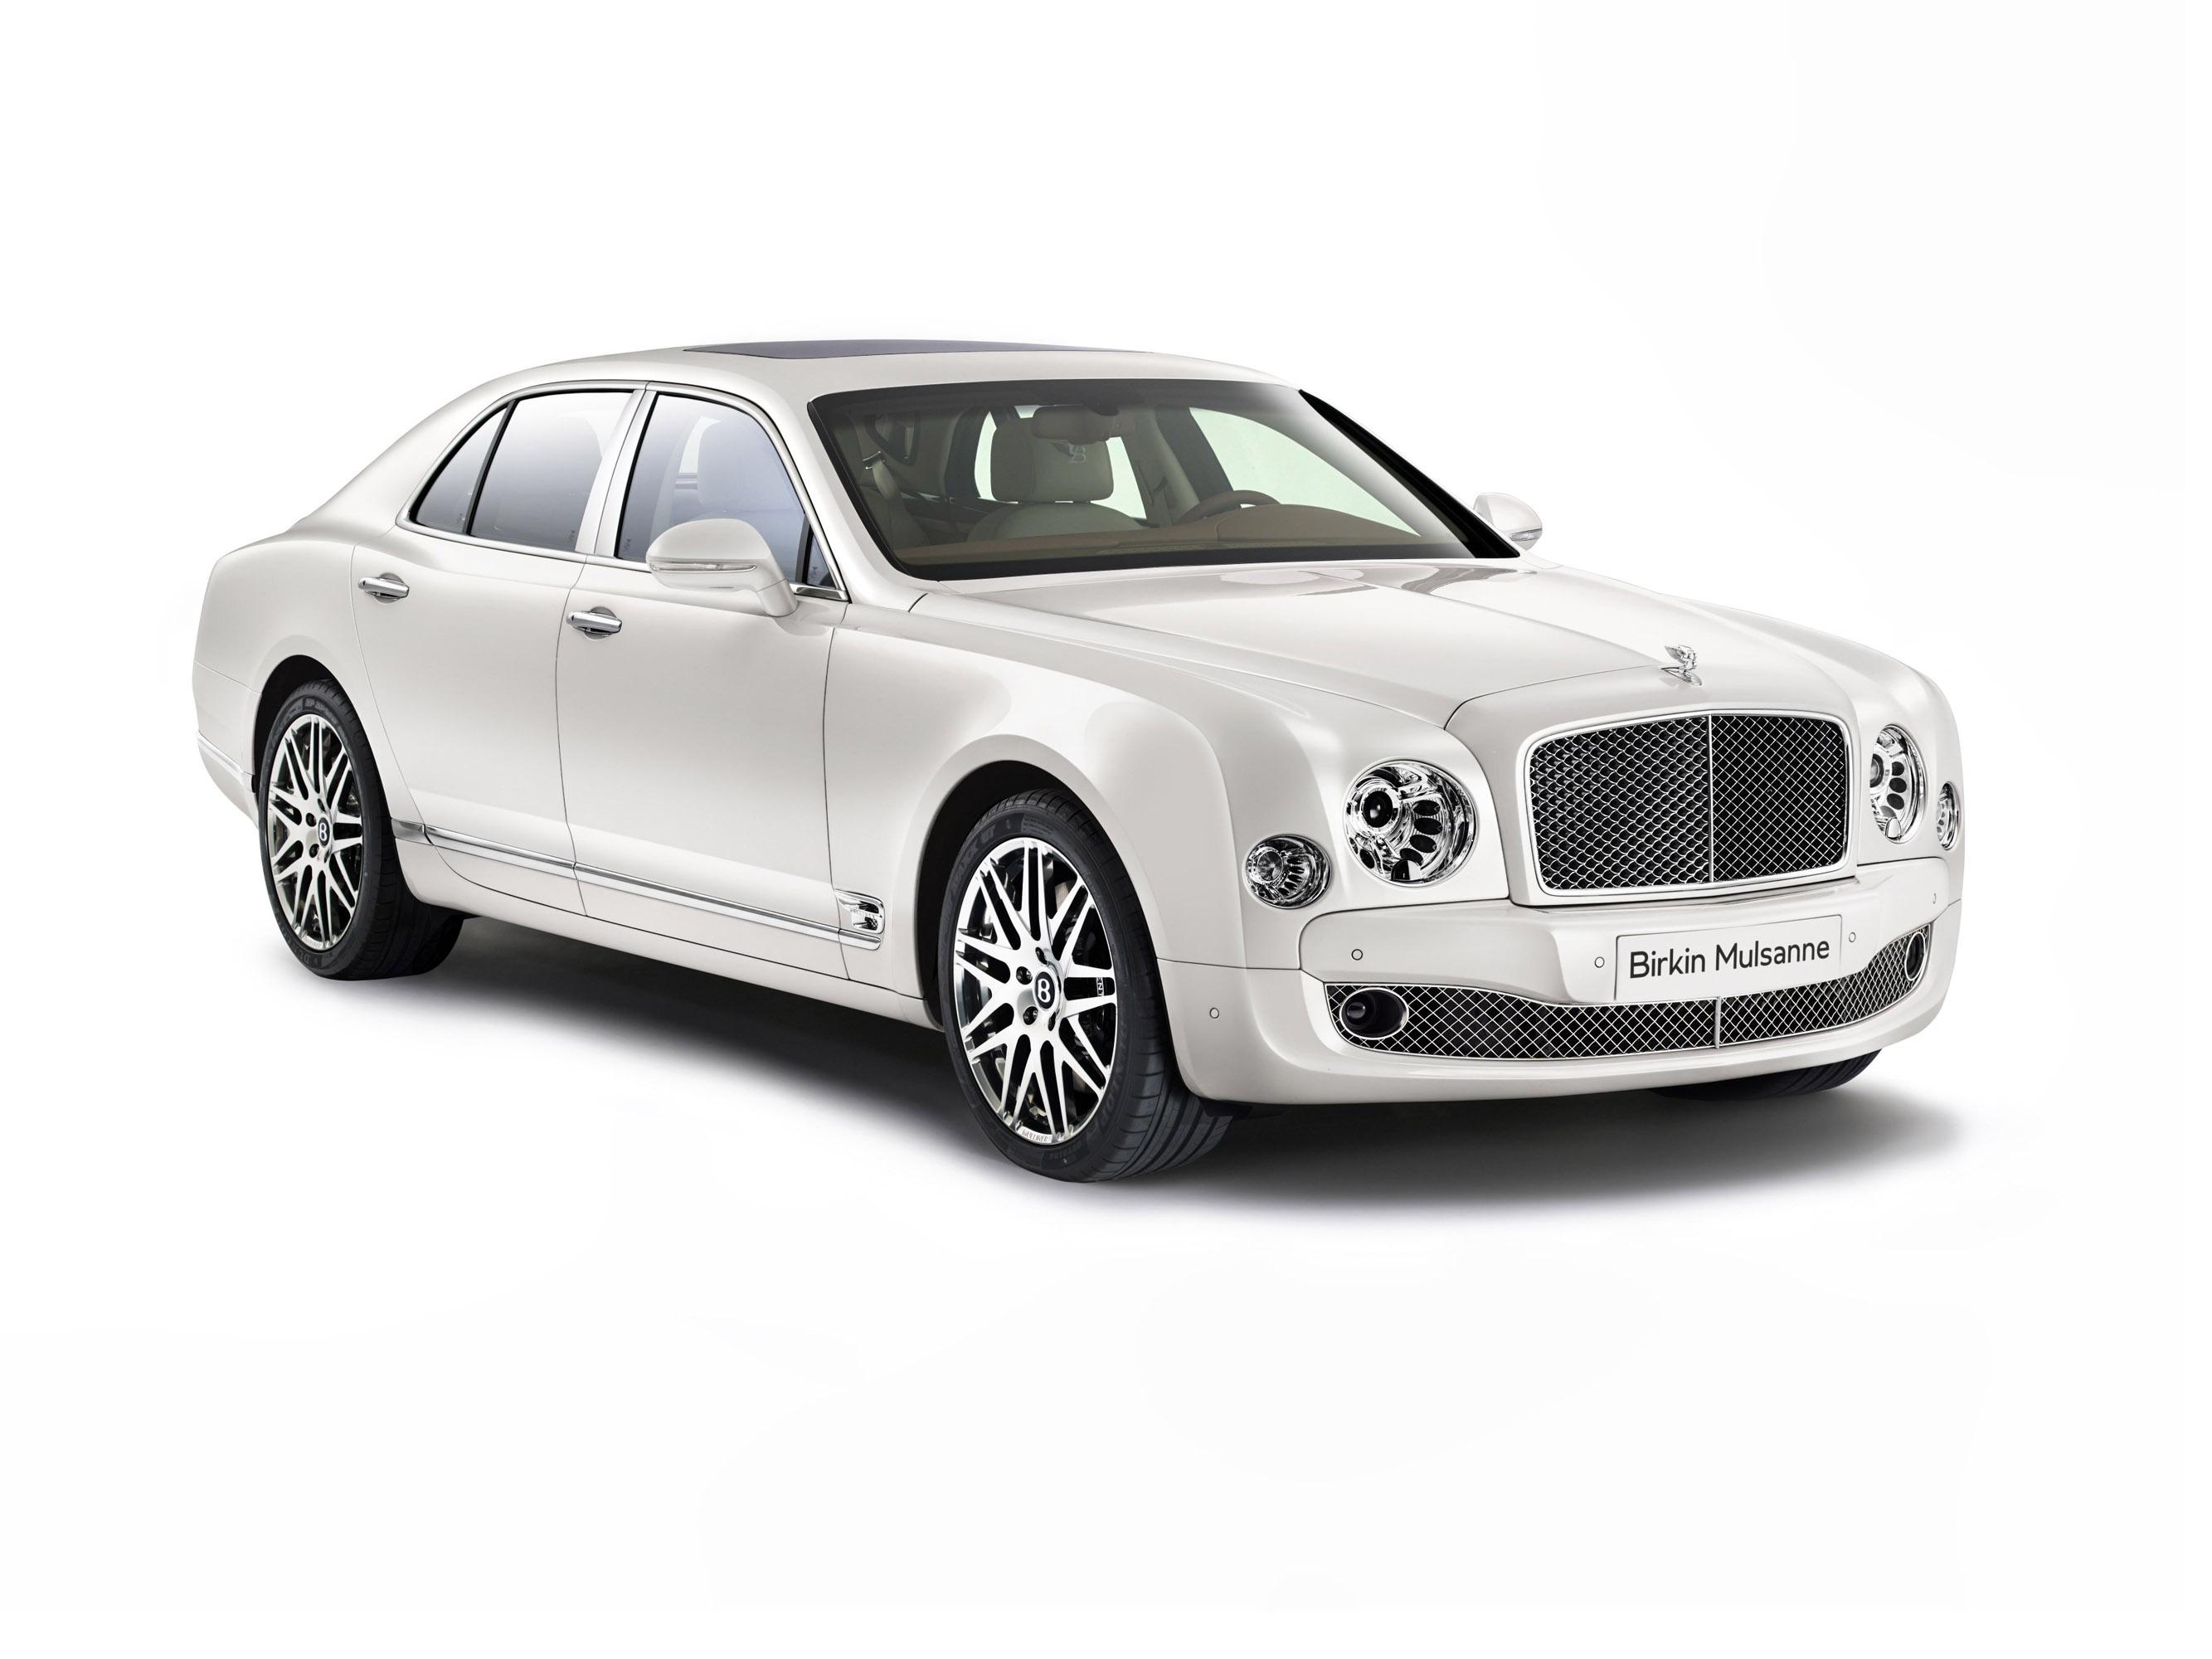 The Bentley Mulsanne S Very Limited: Bentley Introduce Mulsanne Birkin Limited Edition